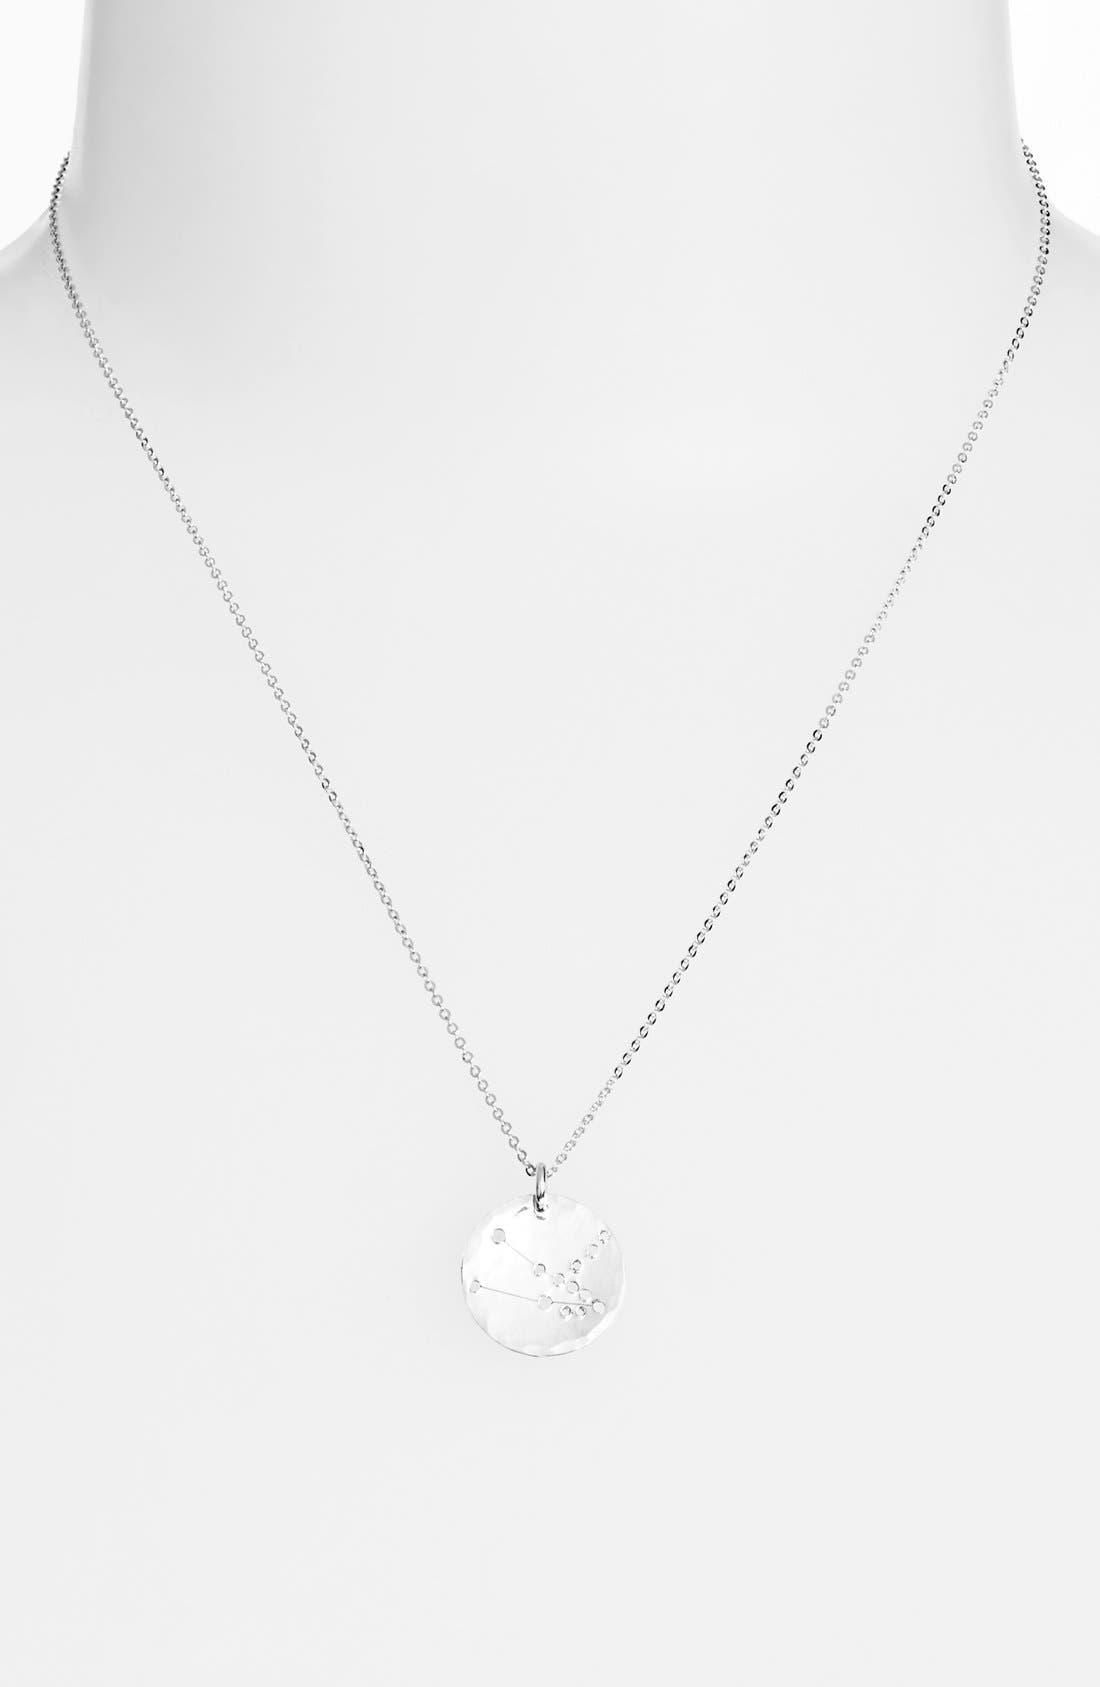 Ija 'Small Zodiac' Sterling Silver Necklace,                             Main thumbnail 2, color,